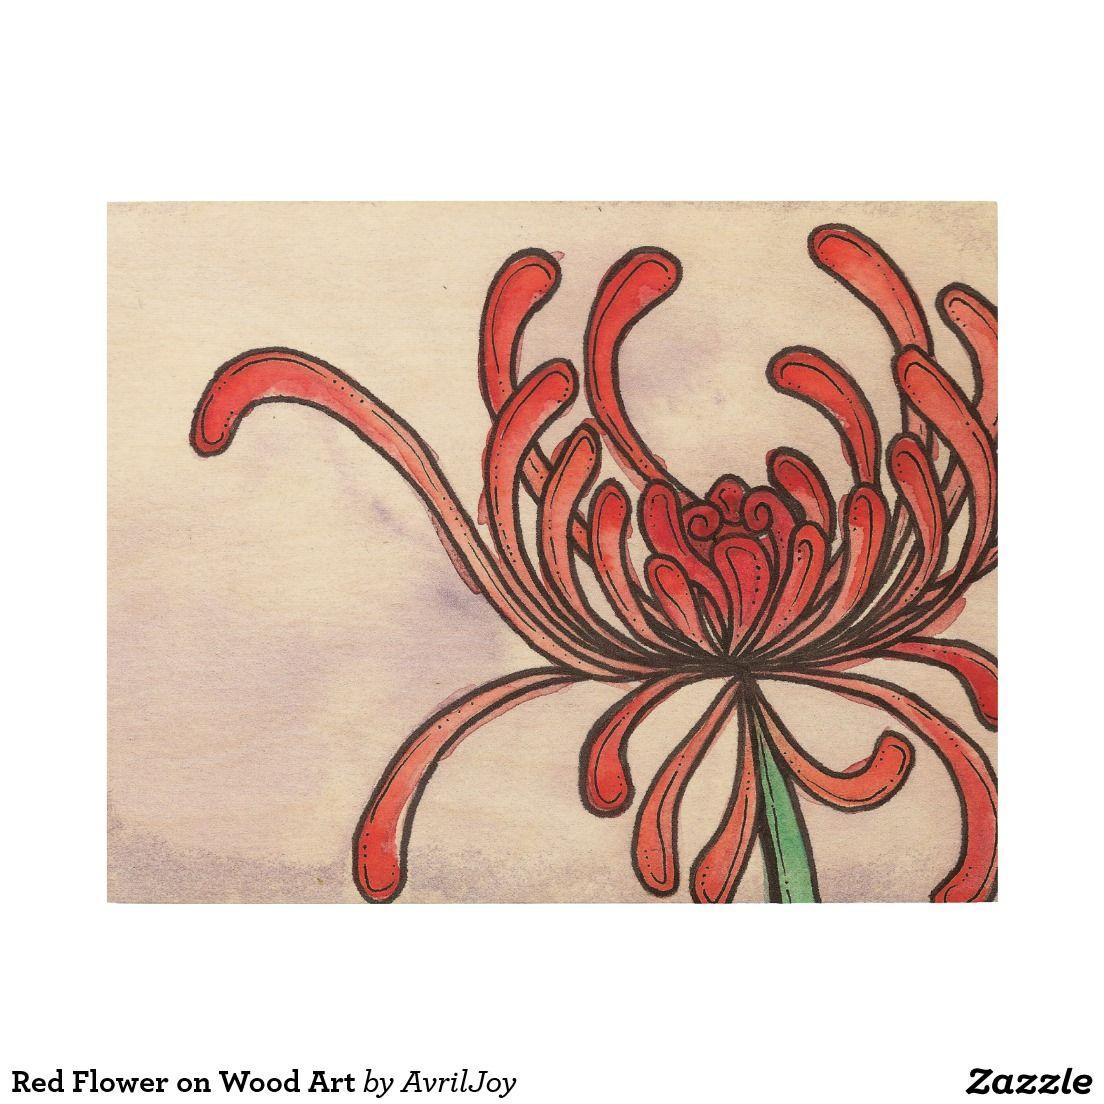 Red Flower on Wood Art